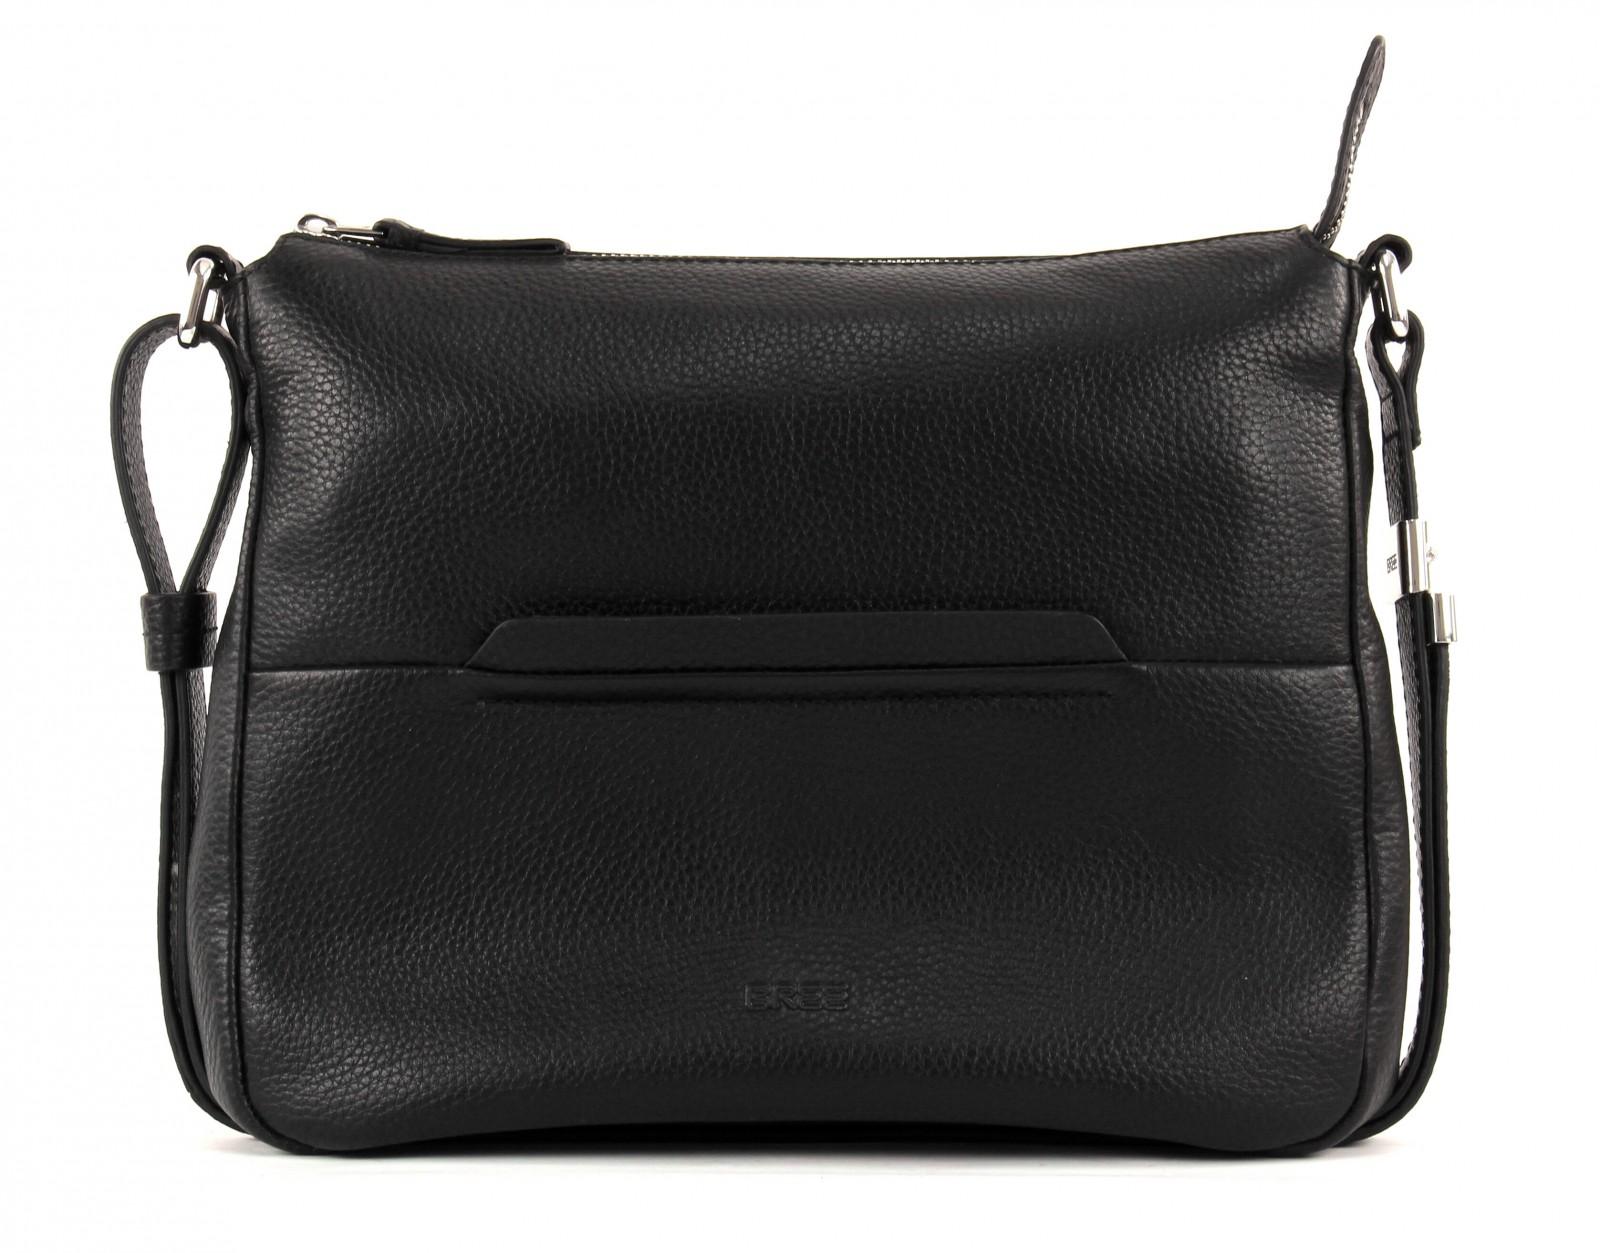 Bree Cross Body Bag Faro 2 Shoulder M Black